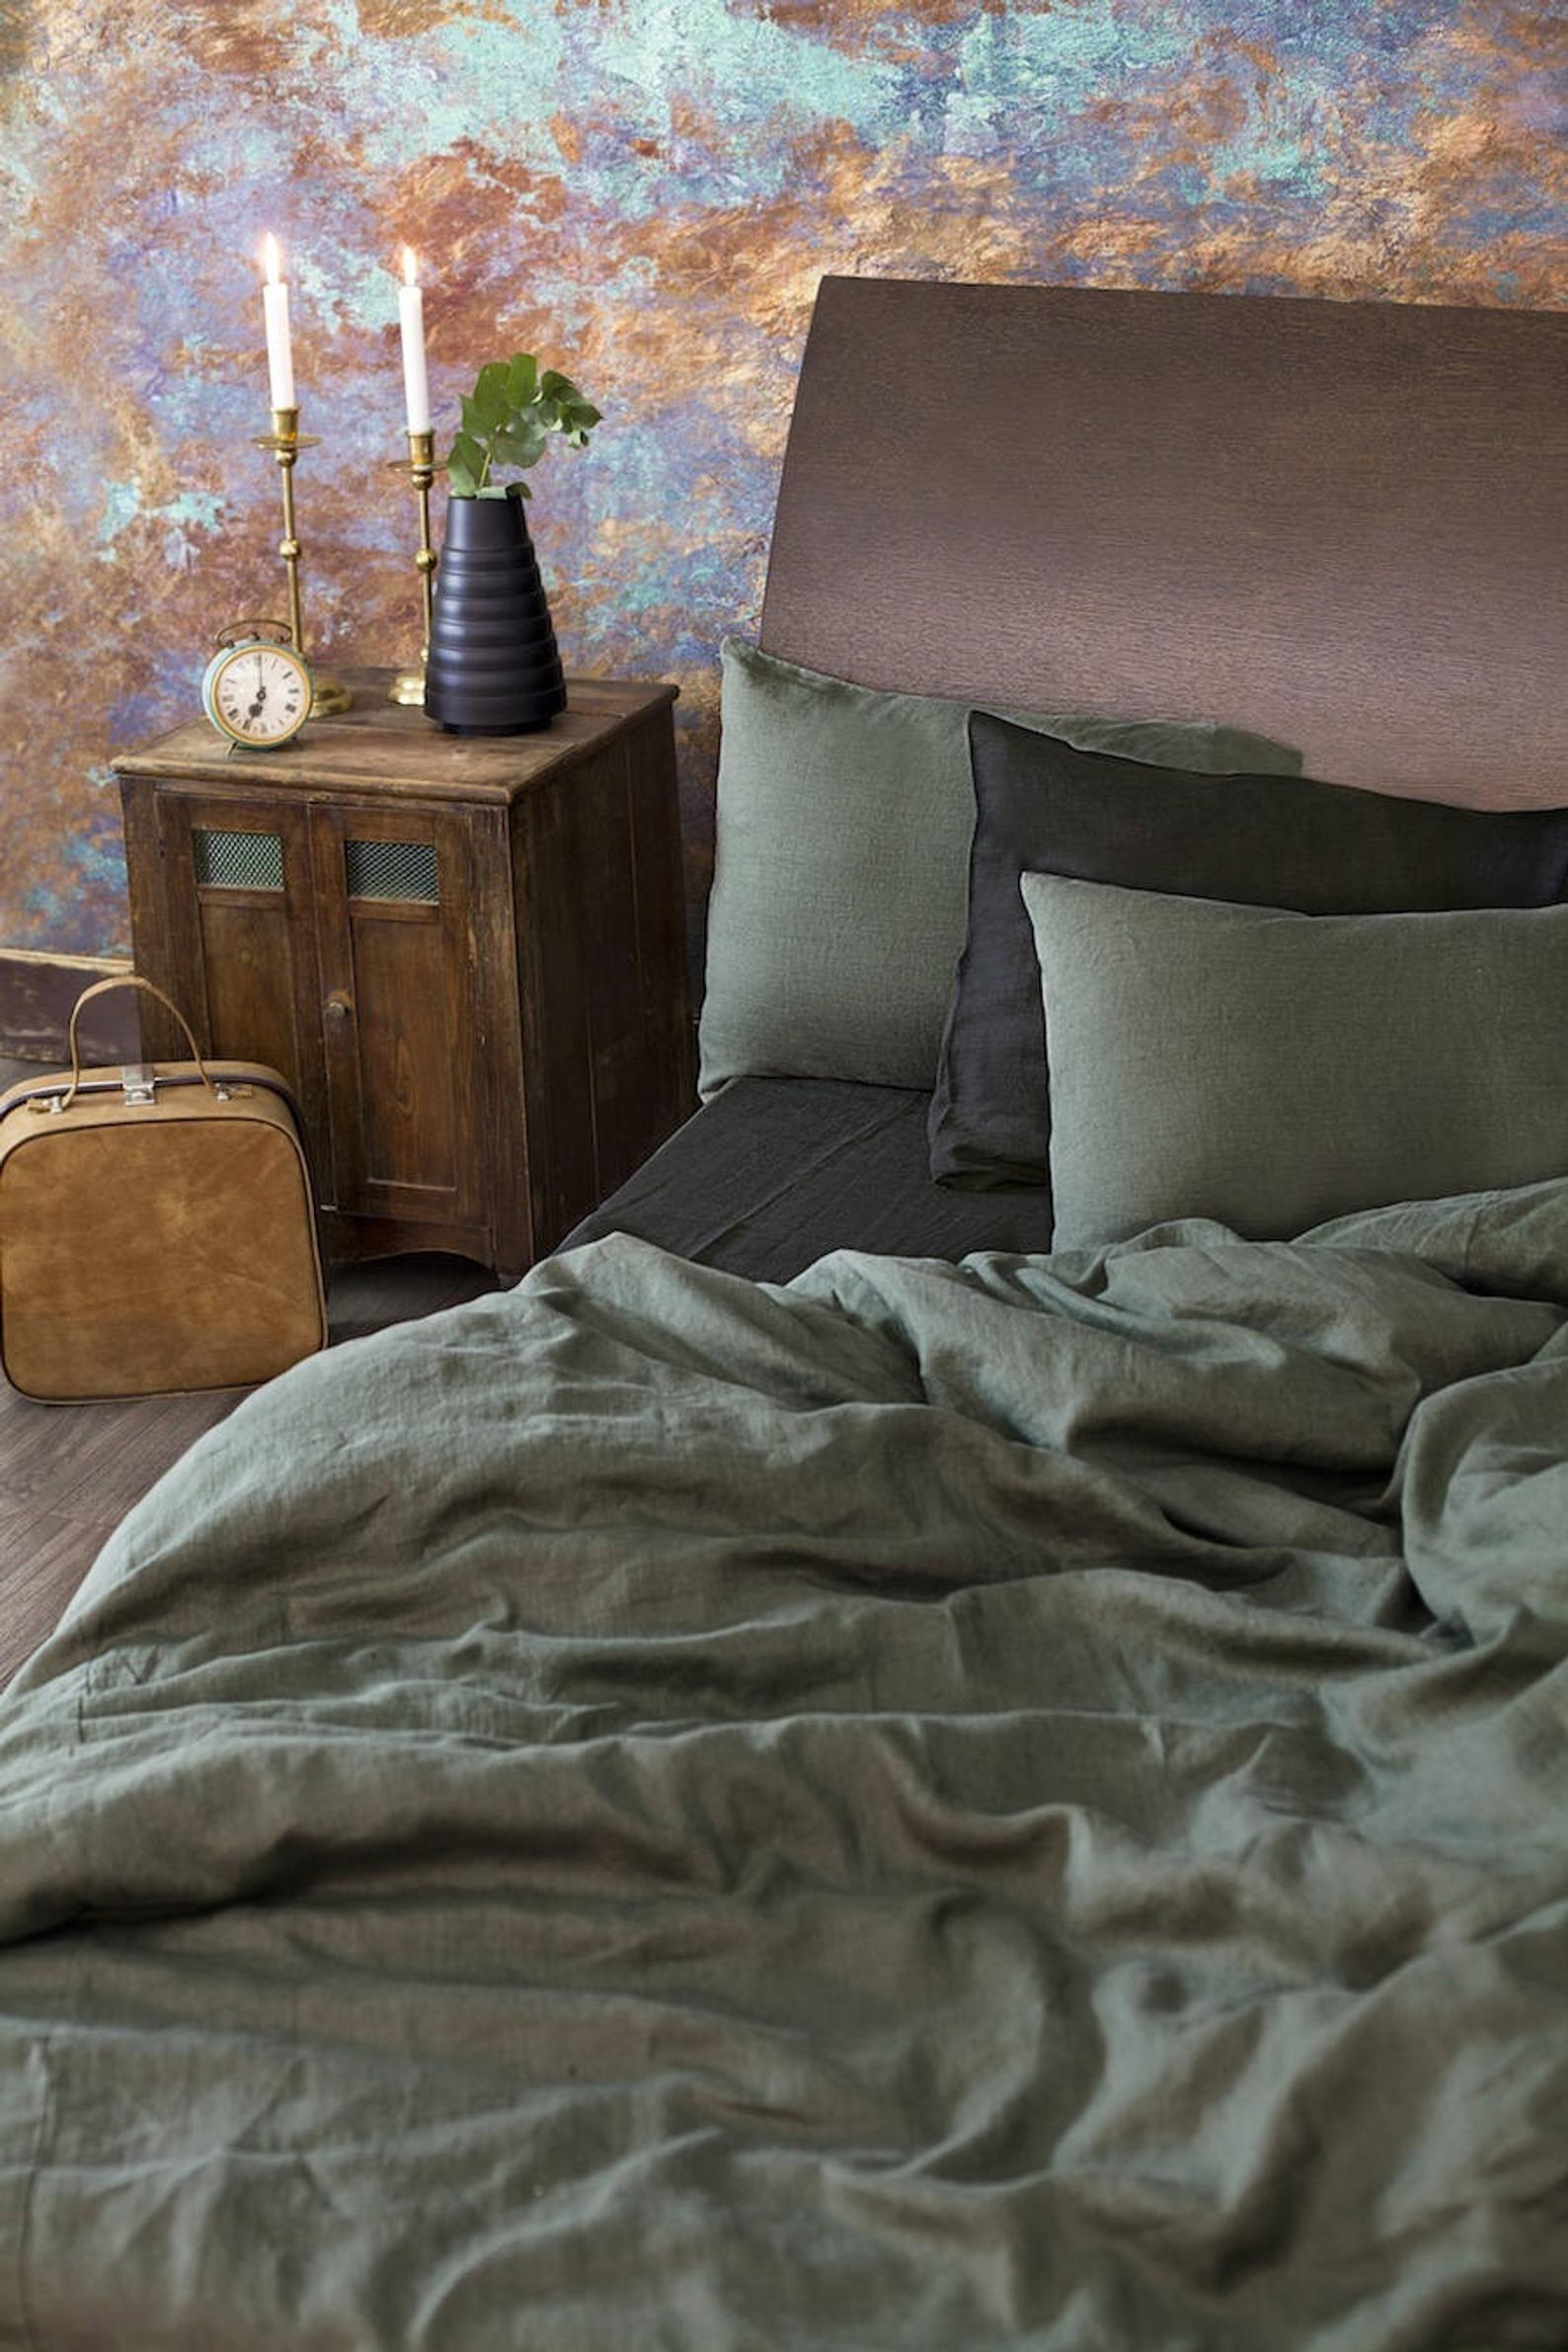 Photo of Linen Duvet Cover in Moss Green in Queen, King sizes